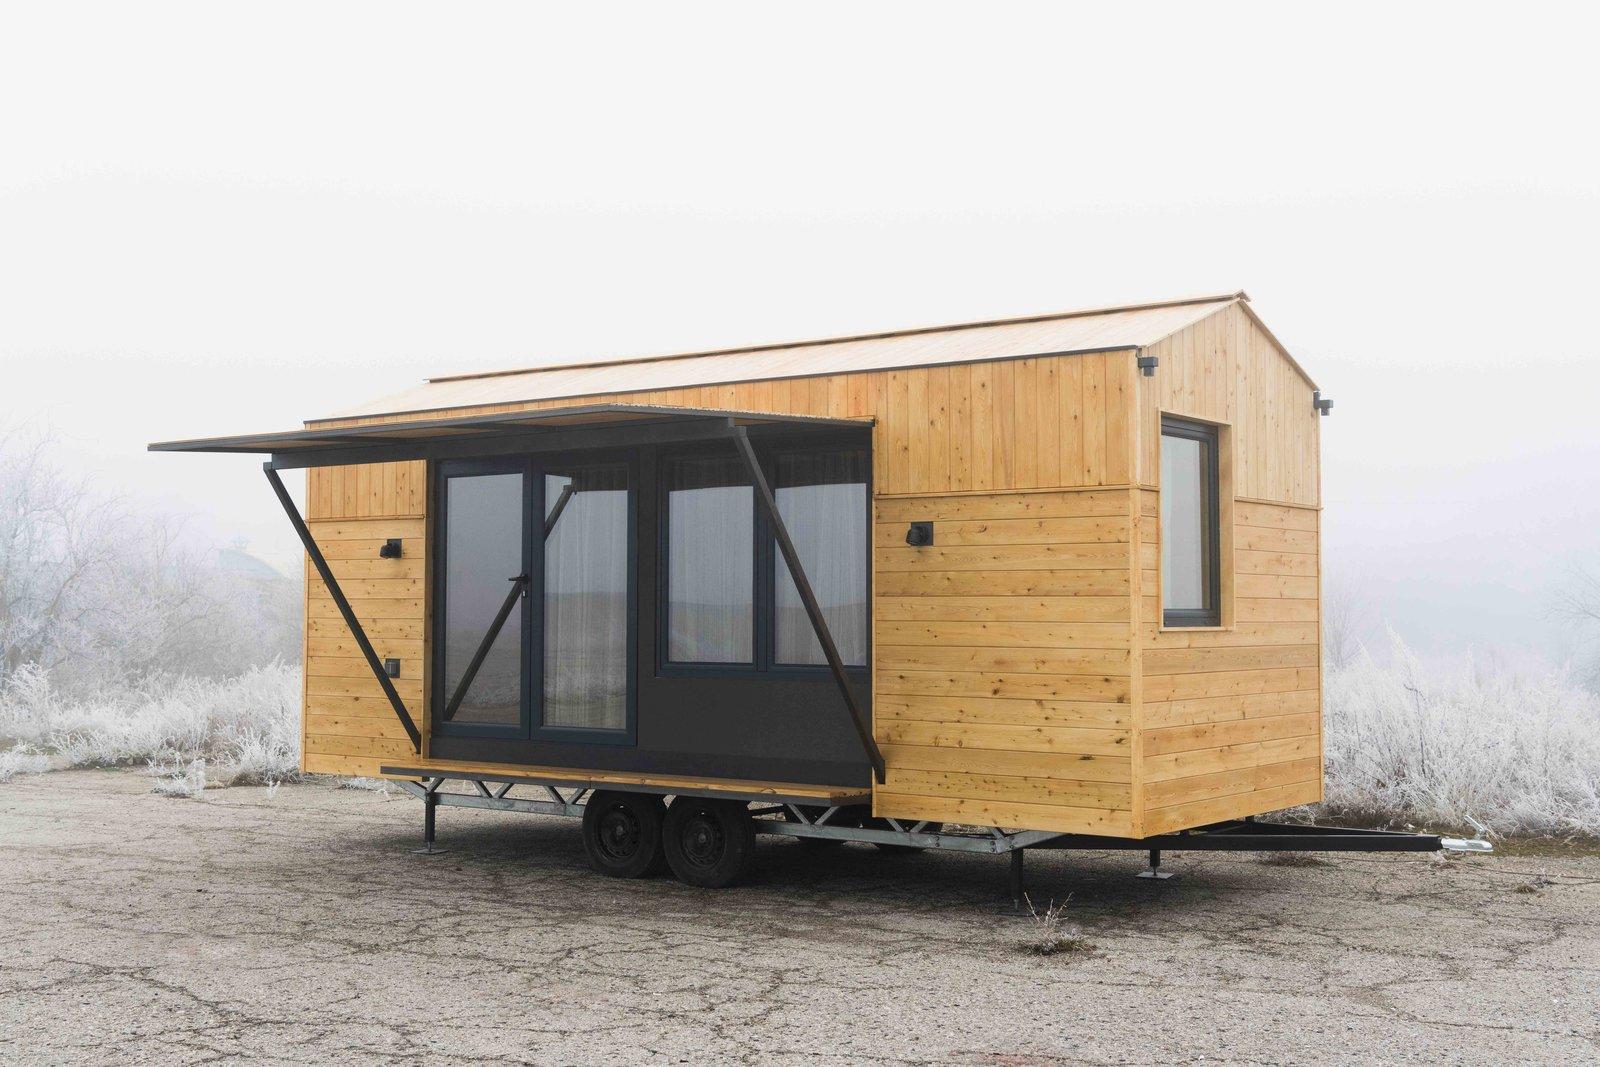 Exterior, Wood Siding Material, and Tiny Home Building Type Side view  KOLELIBA Family Tiny House